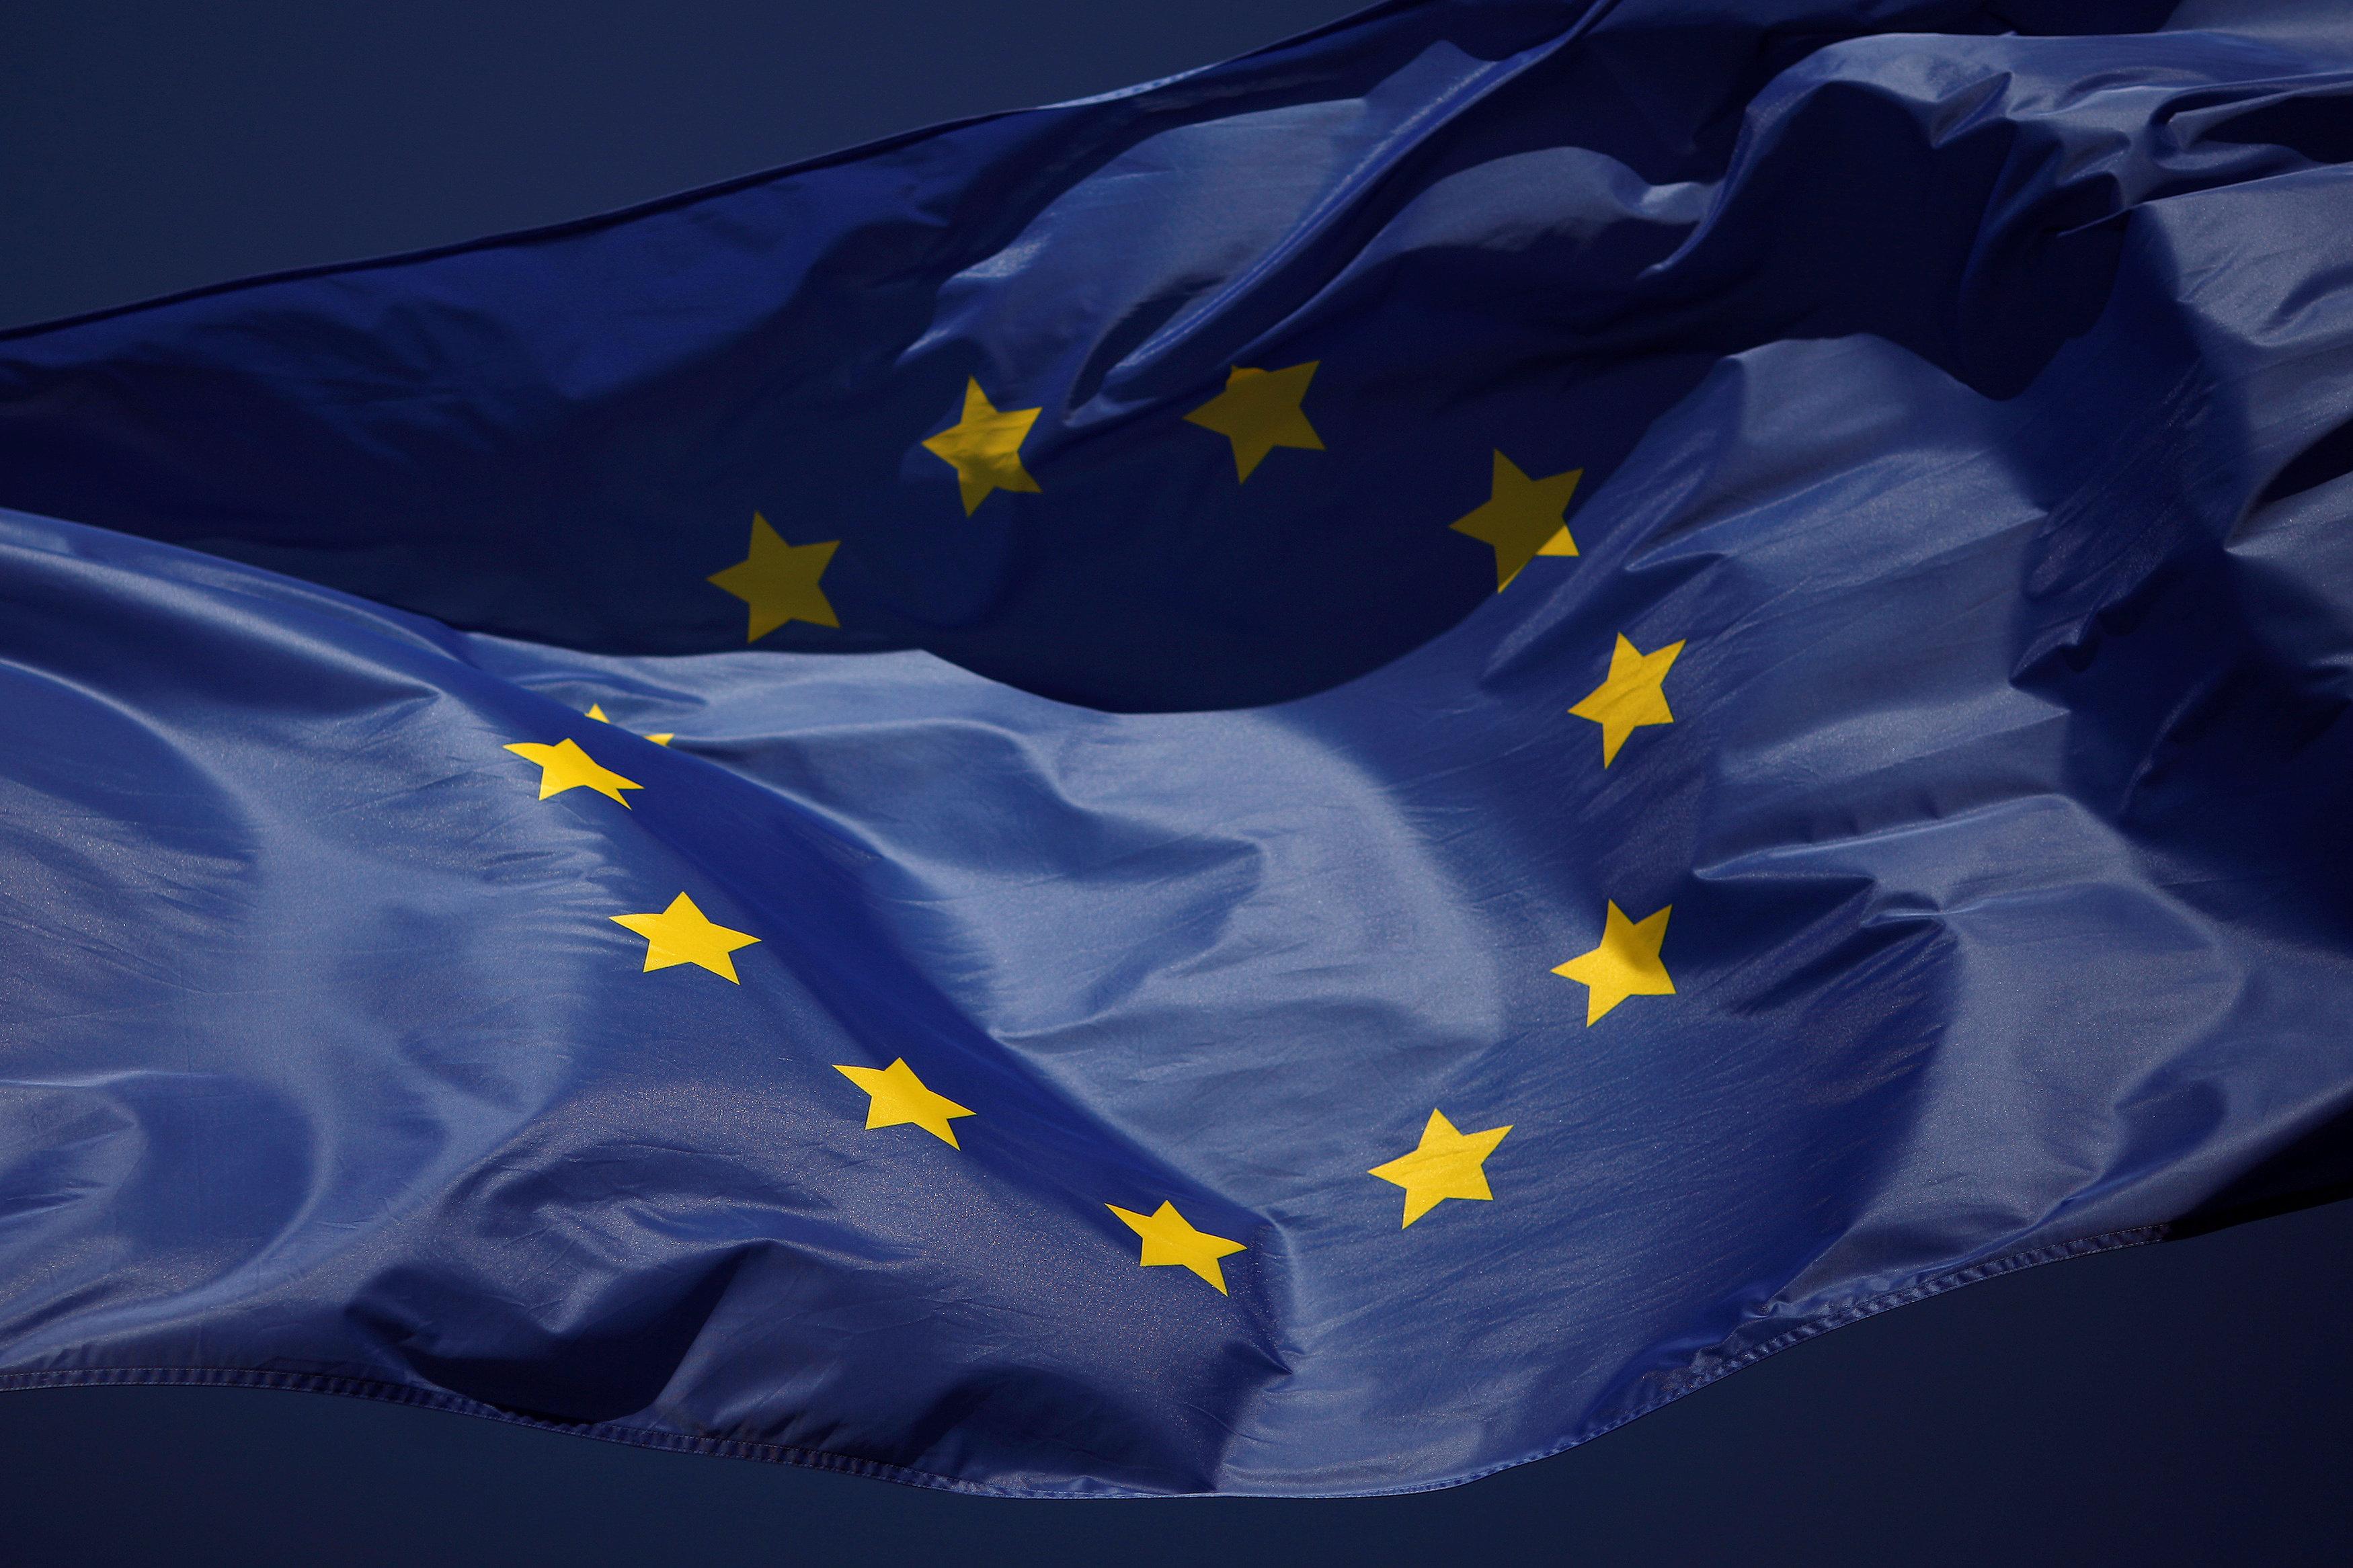 In fresh poll, Icelanders reject prospect of EU membership by wide margins